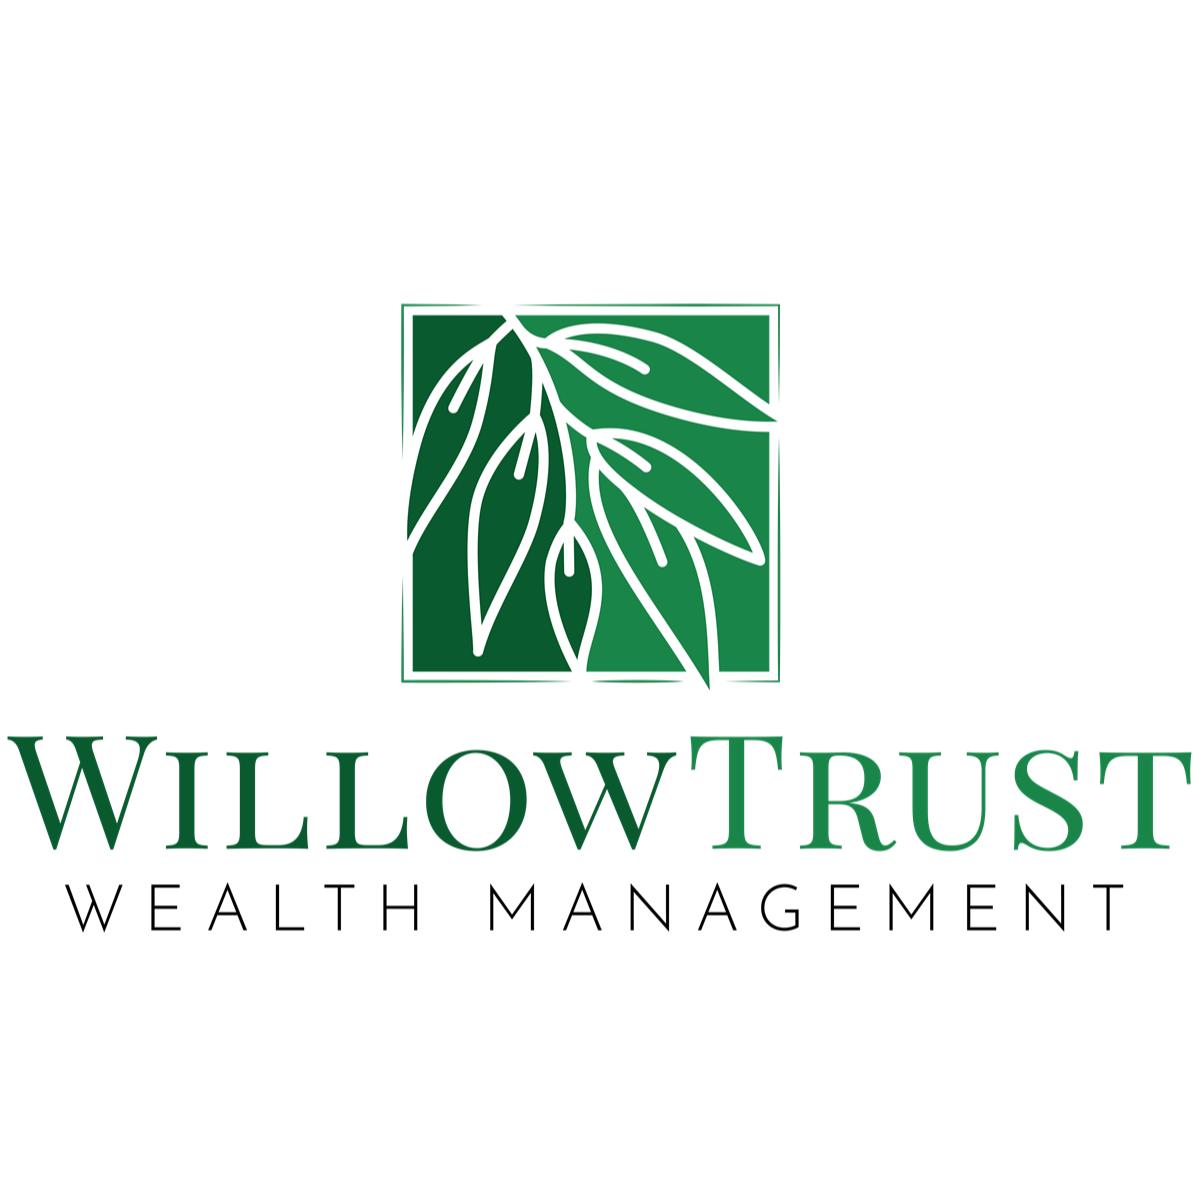 Willow Trust Wealth Management